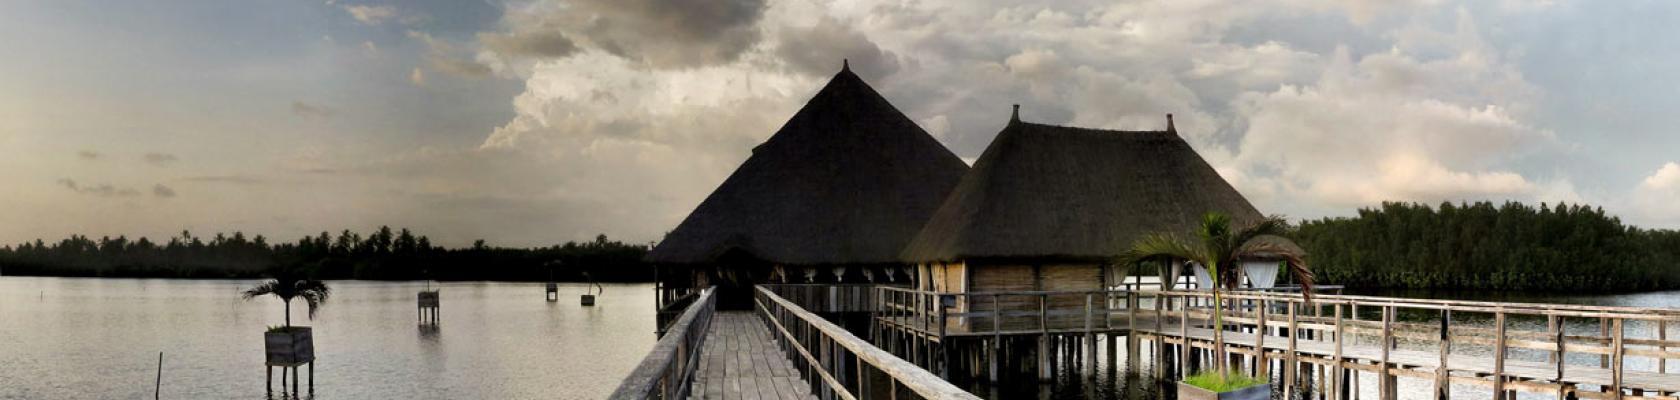 Bénin, Ouidah, casa del papa